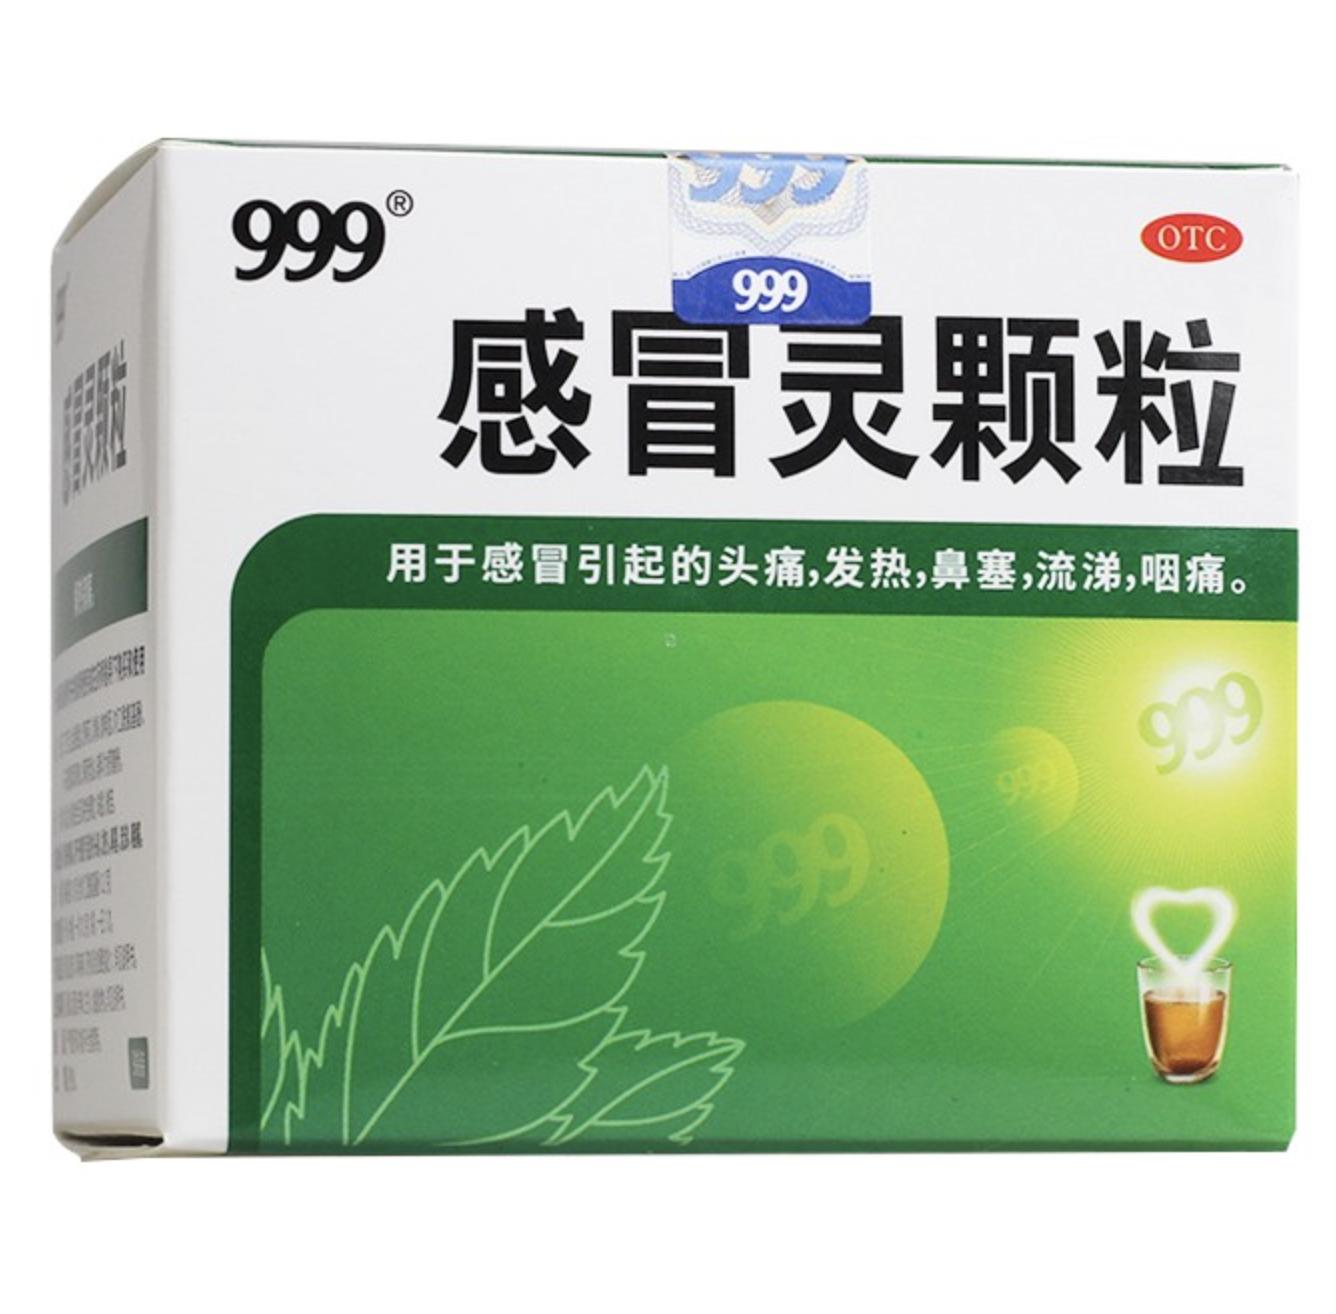 GROC【杂货】999 感冒灵颗粒